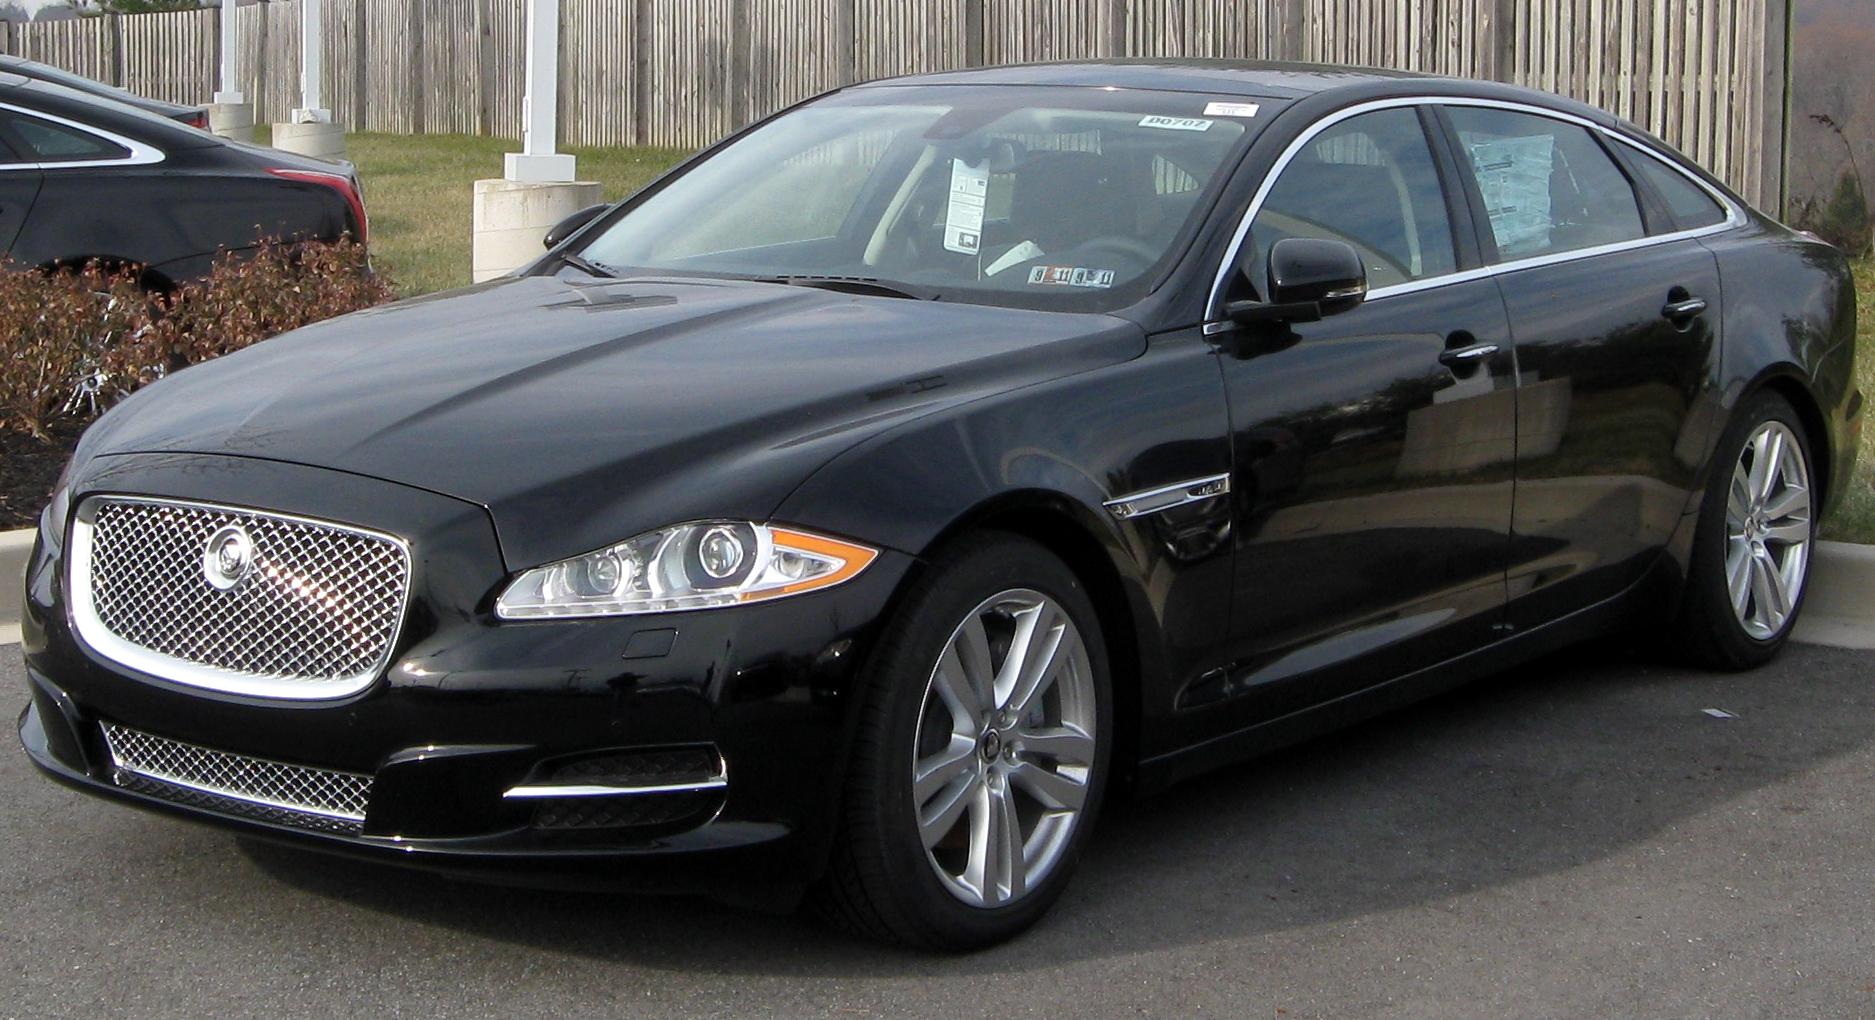 Jaguar Xe Release Date >> File:2011 Jaguar XJ8 -- 12-31-2010.jpg